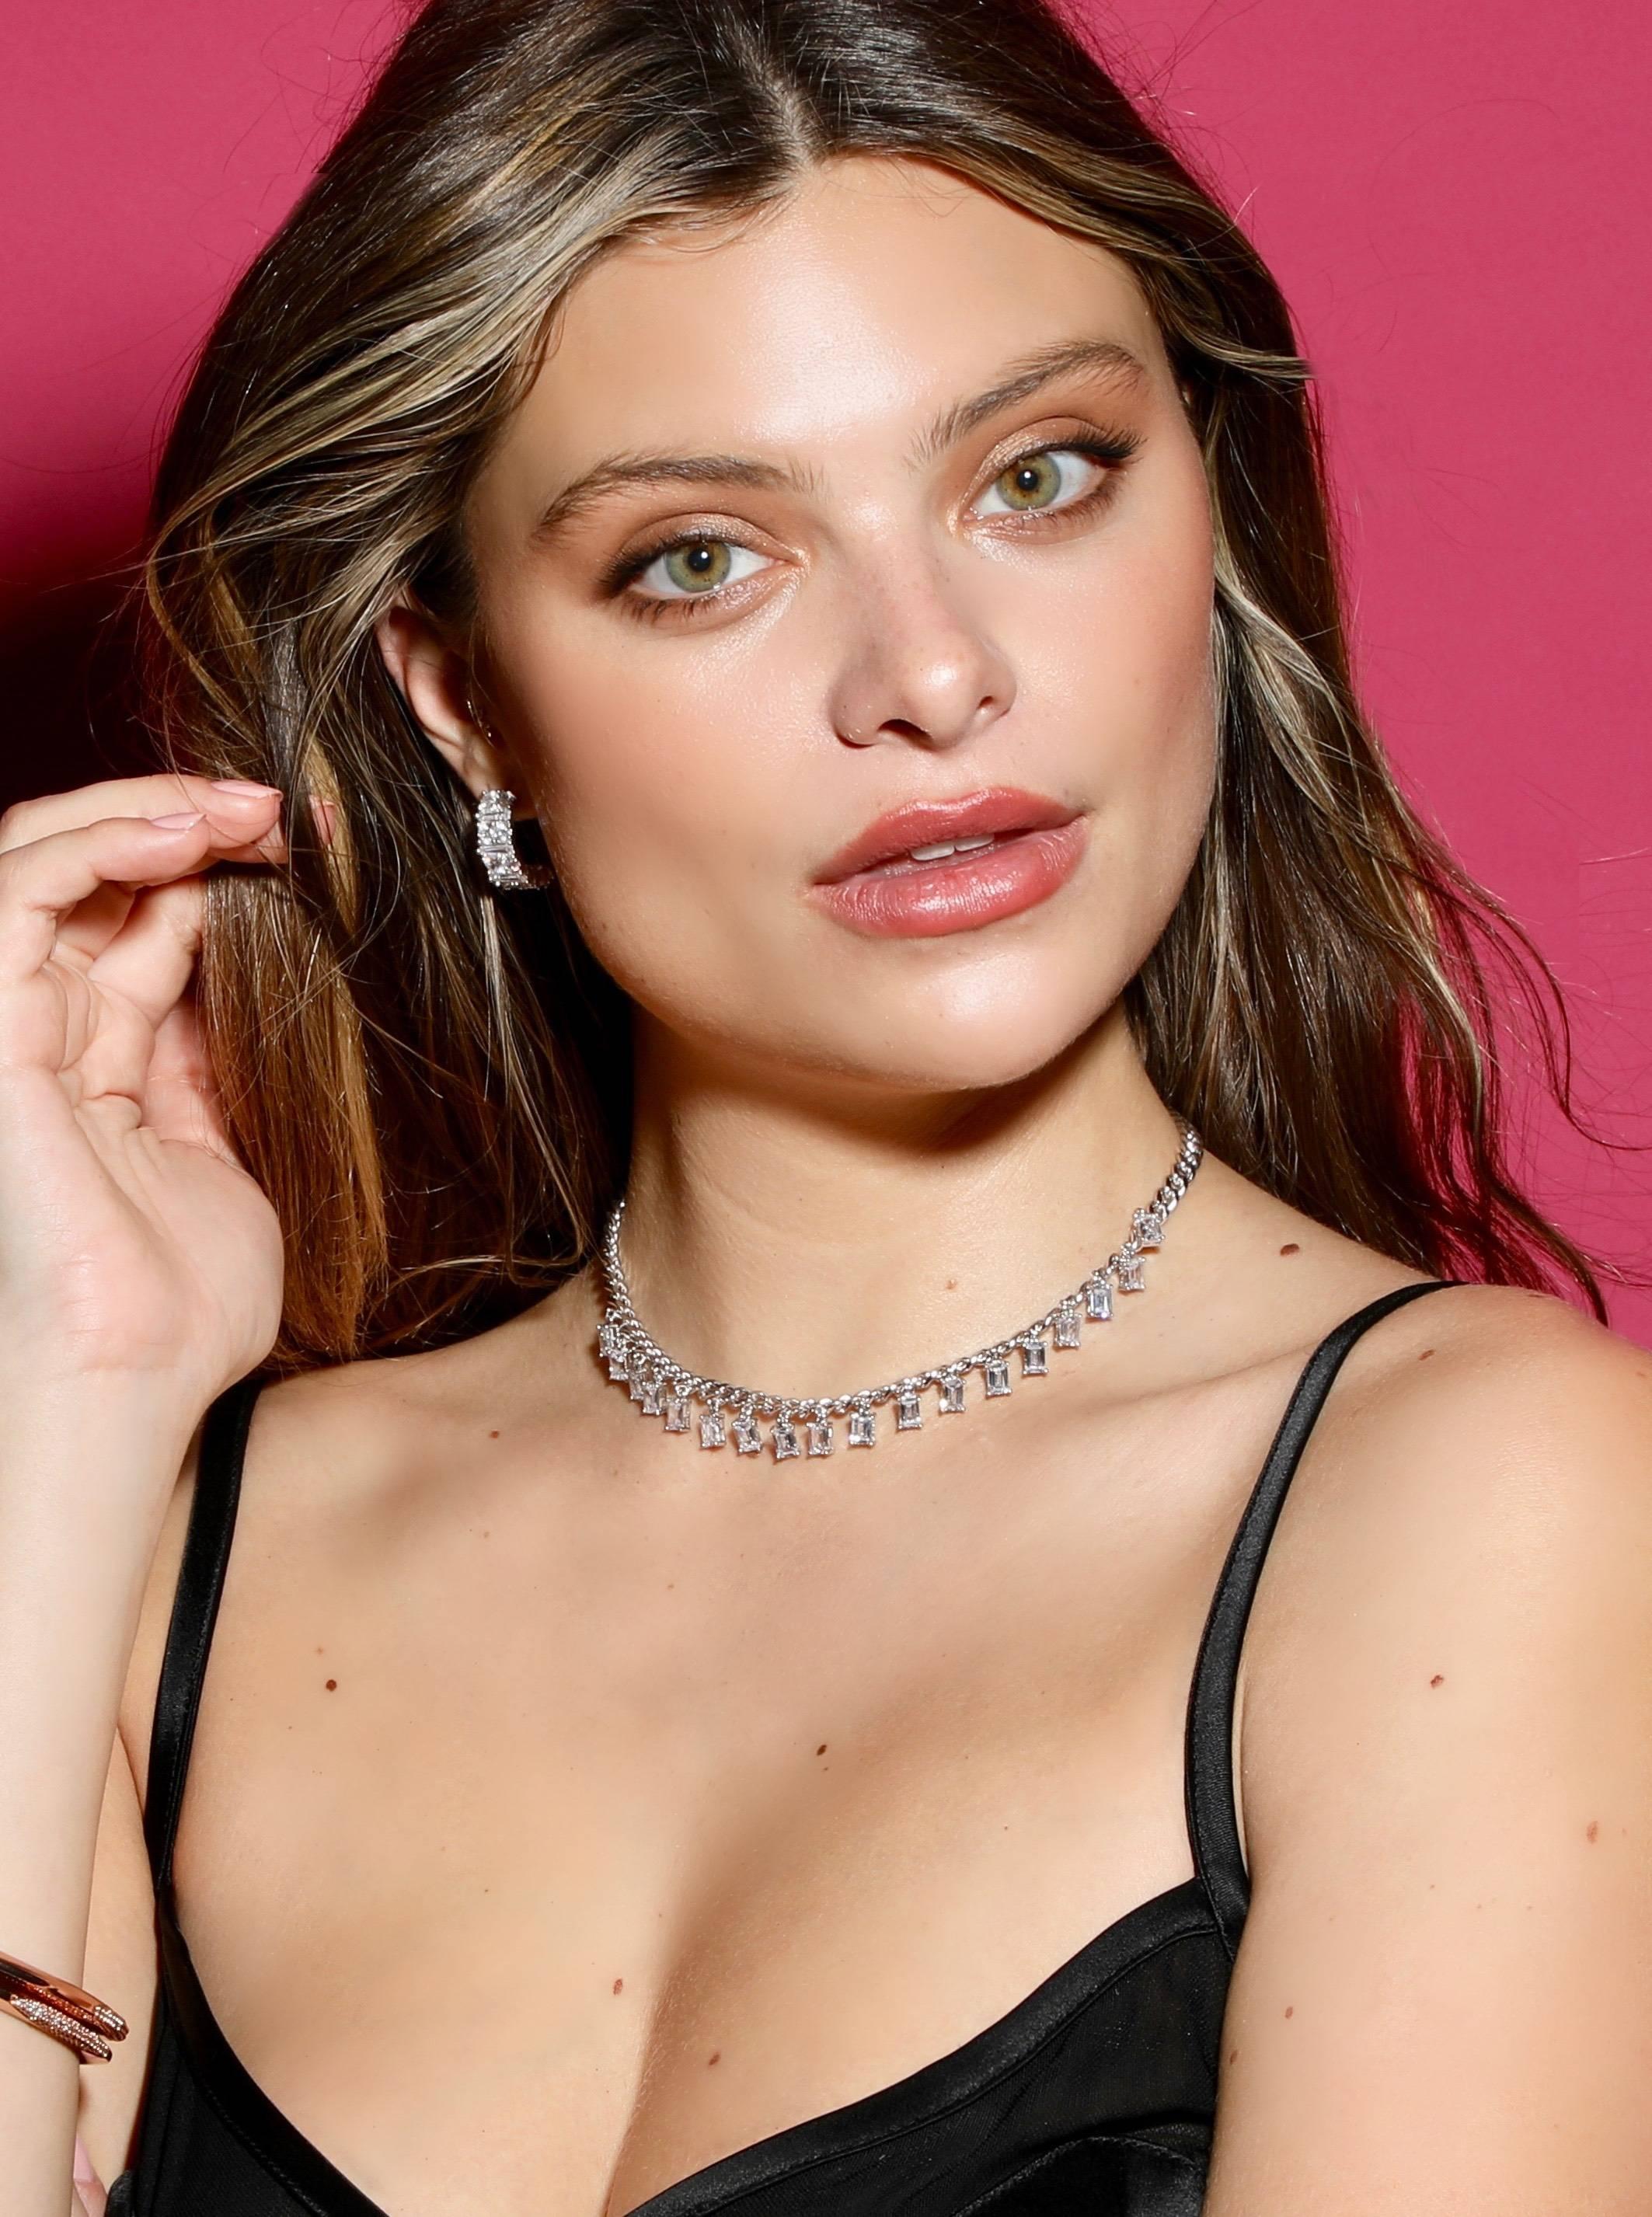 Sparkly Everyday Jewelry On Female Model